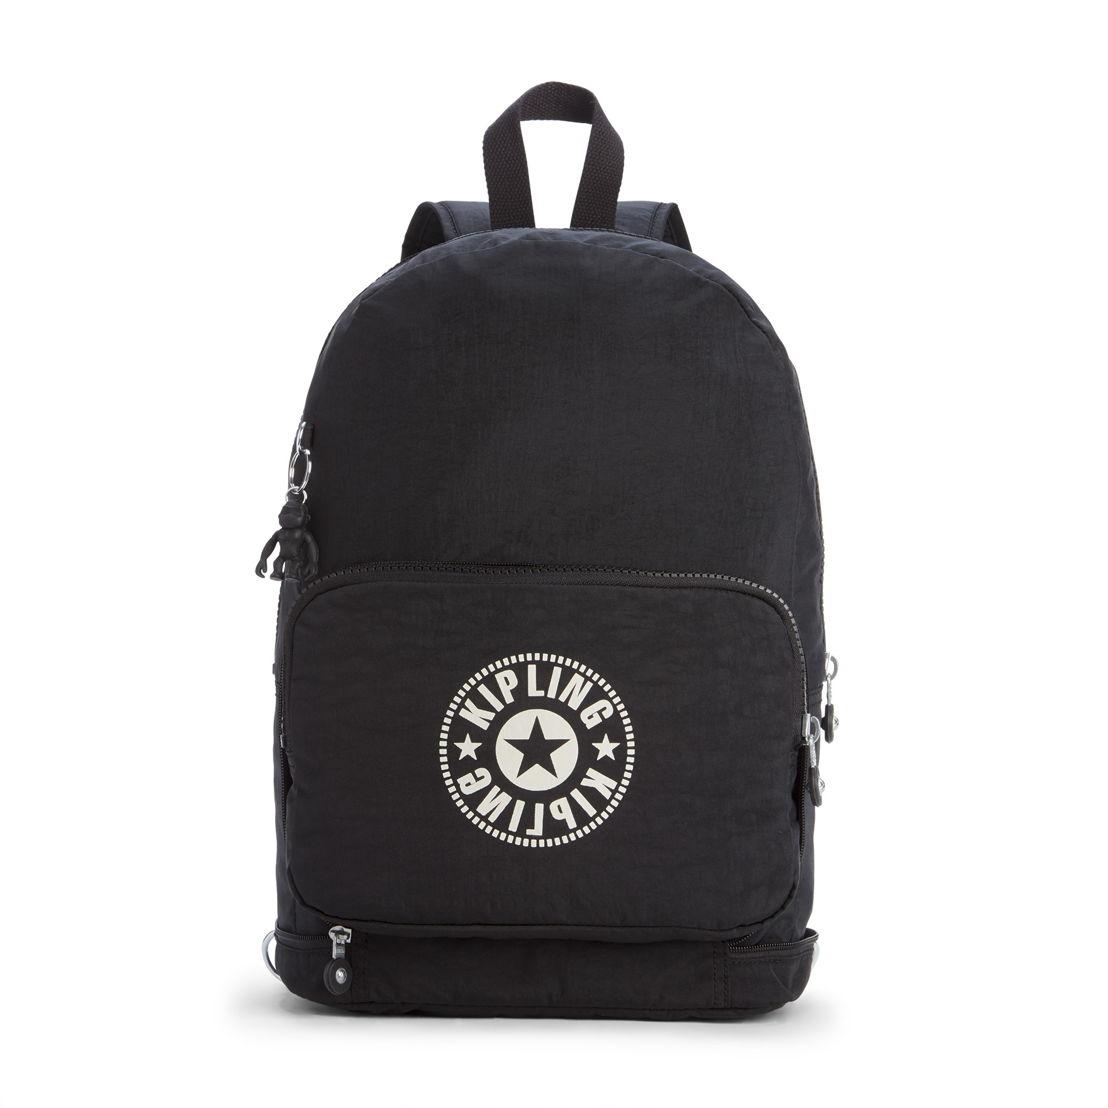 CLASSIC NIMAN FOLD Lively Black - 74.90€ (unfolded - backpack)